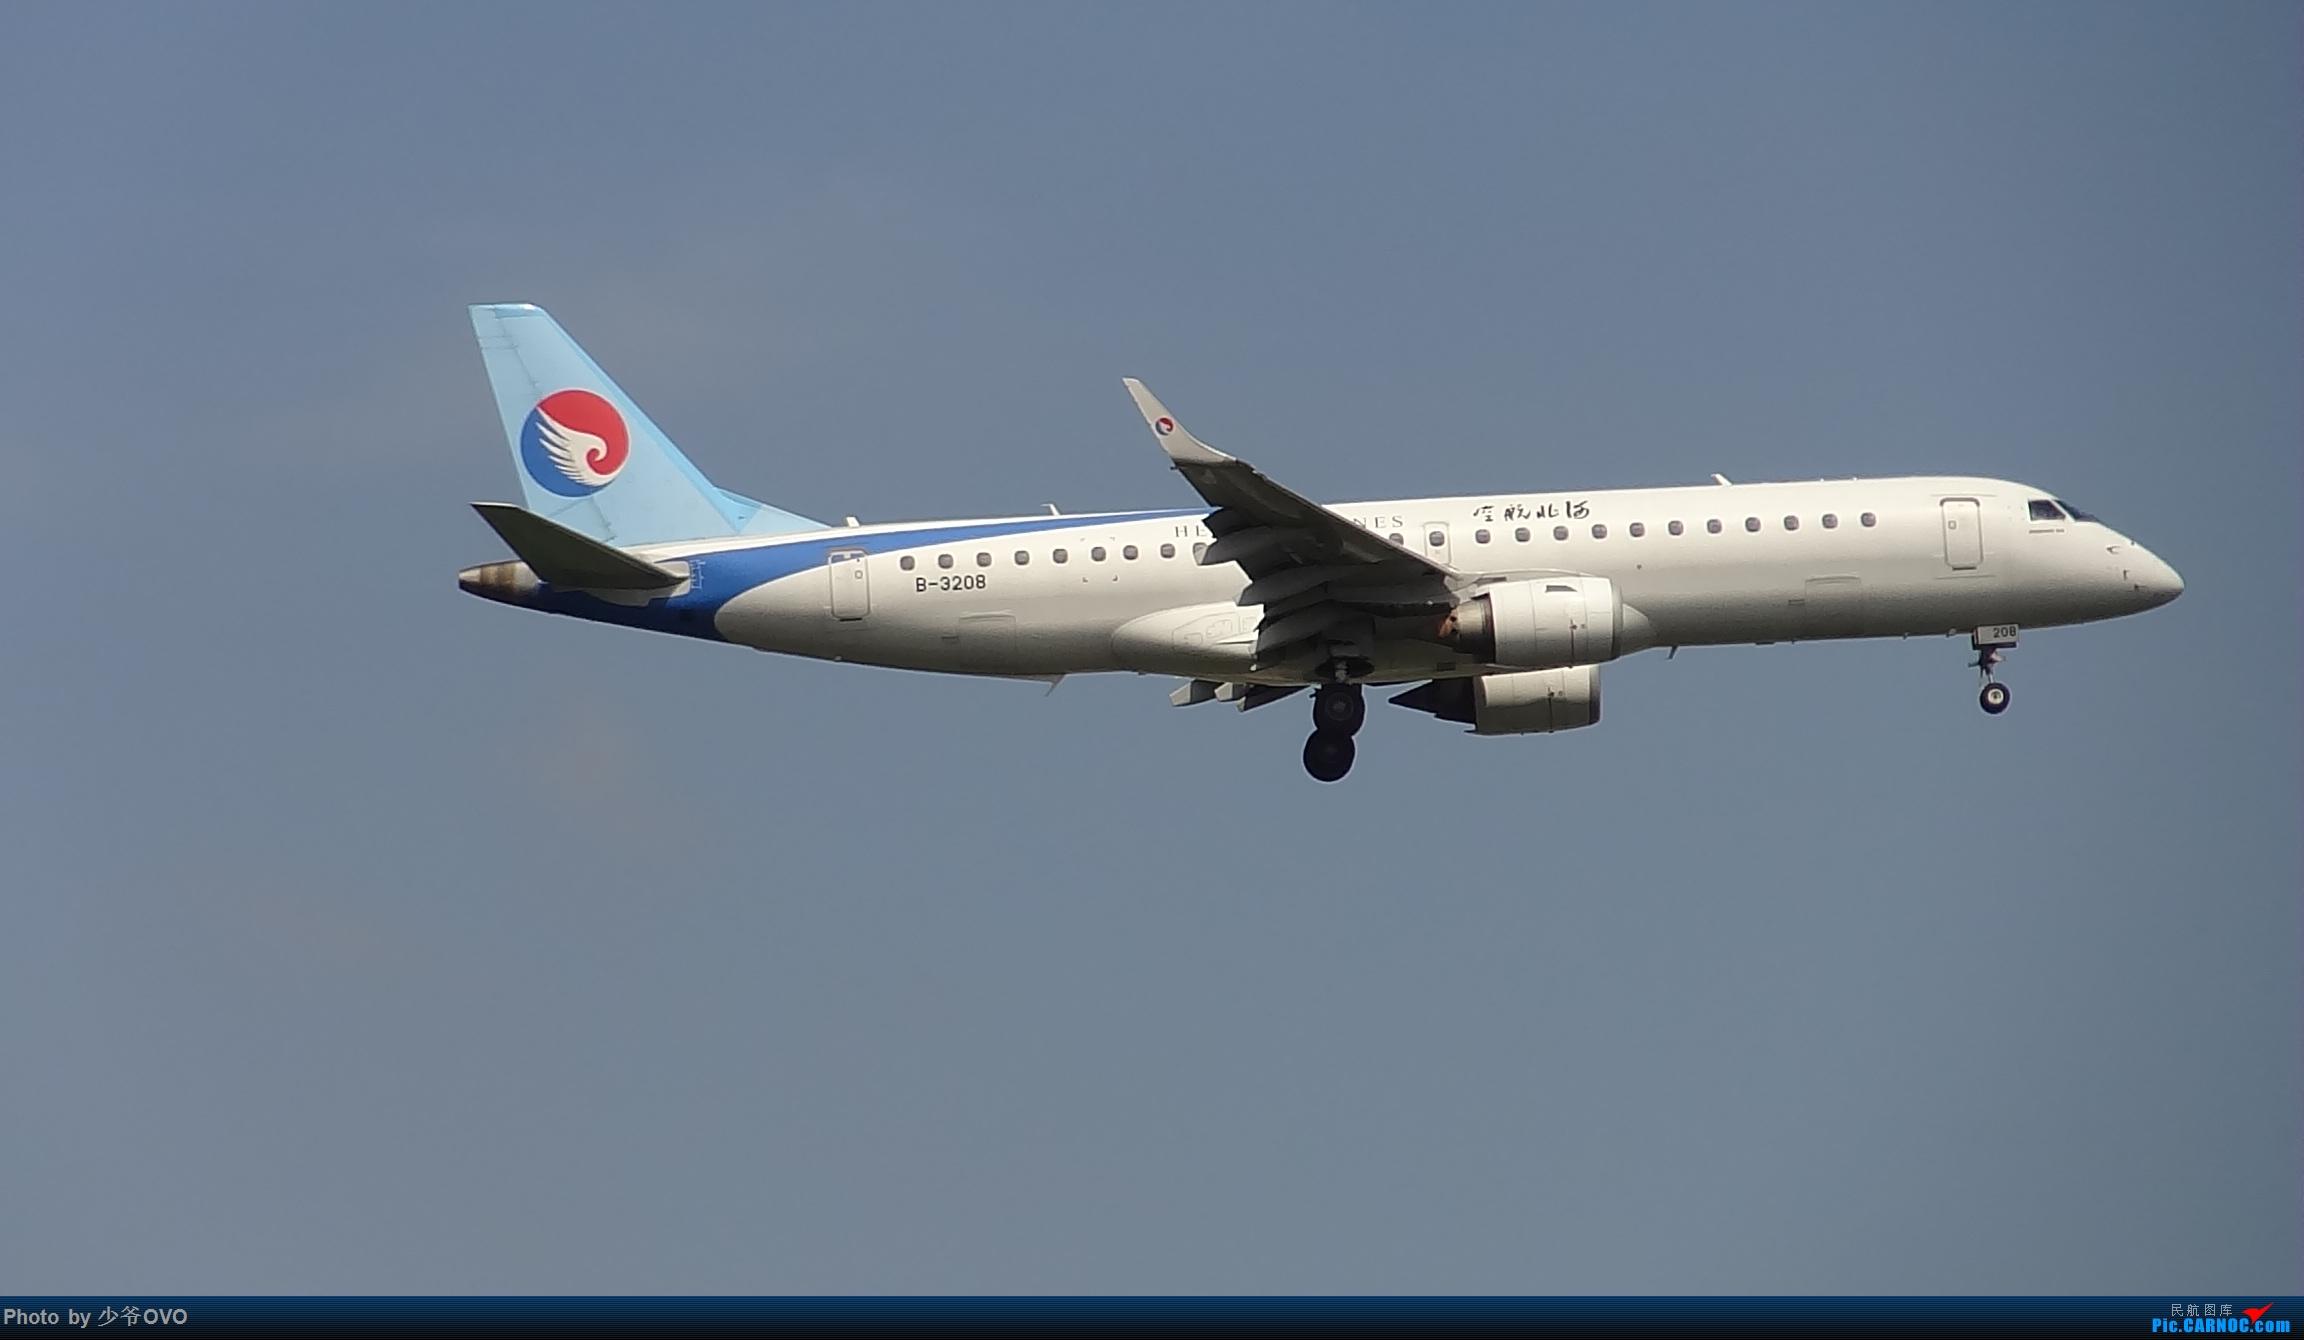 Re:[原创]CKG重庆江北机场拍机 EMBRAER E-190 B-3208 中国重庆江北国际机场